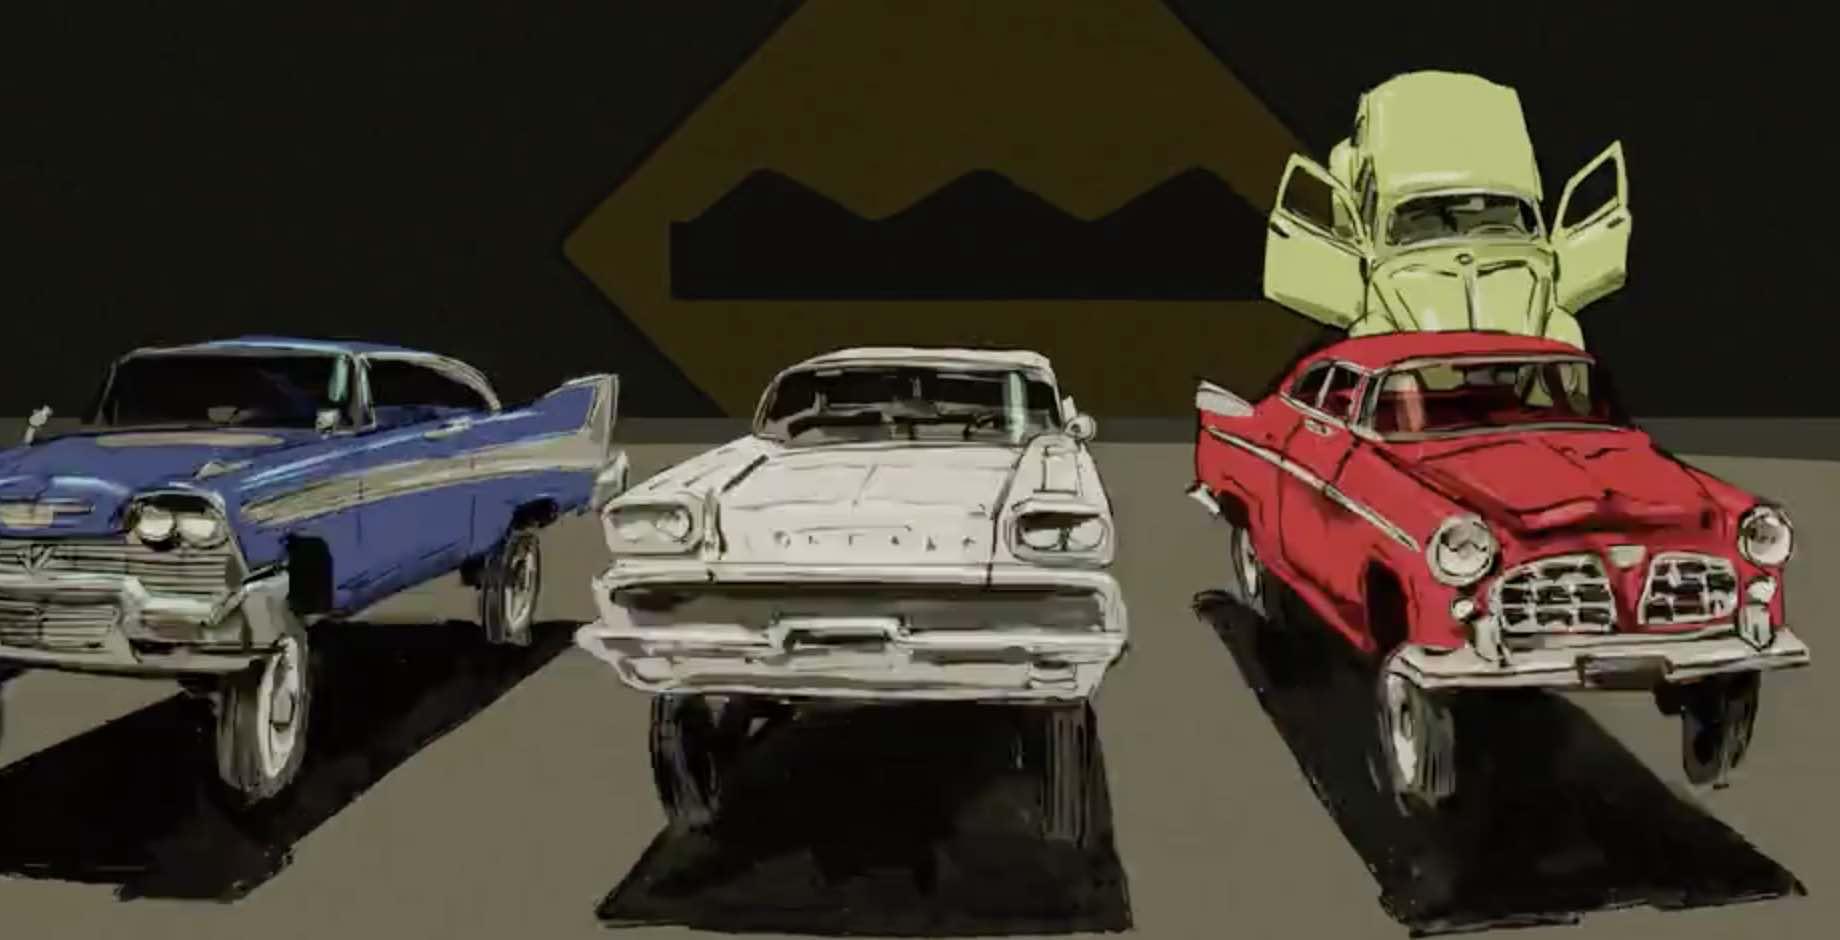 NFB National Film Board Vimeo